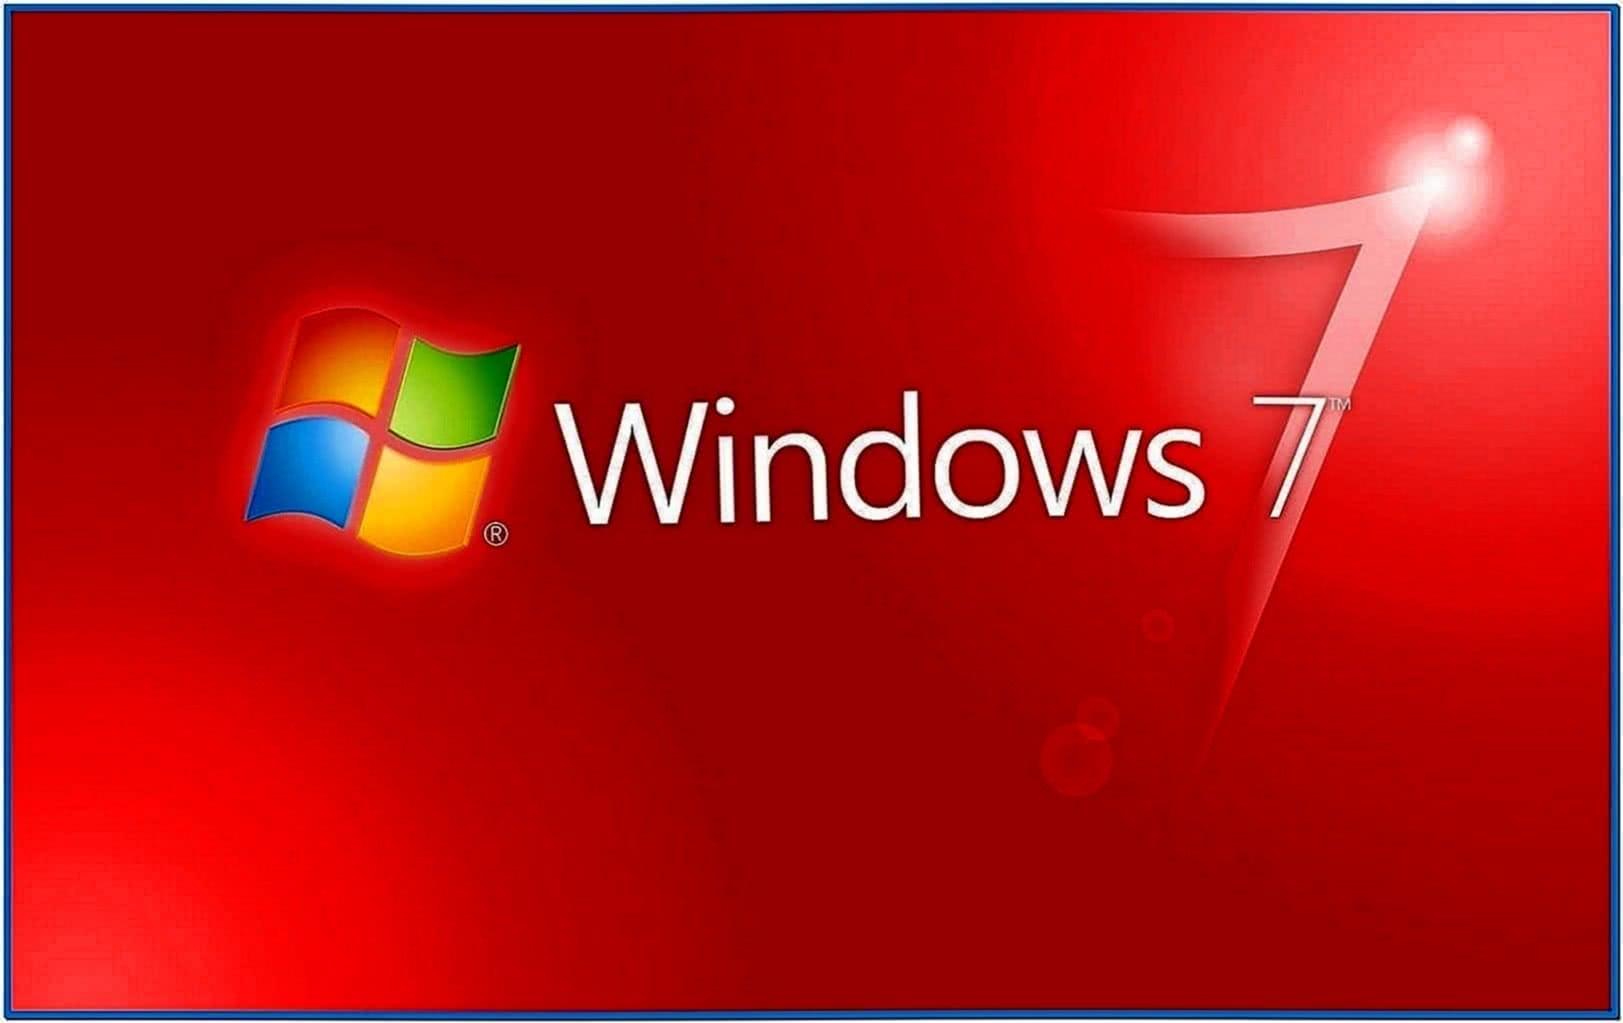 HD Animated Screensavers Windows 7